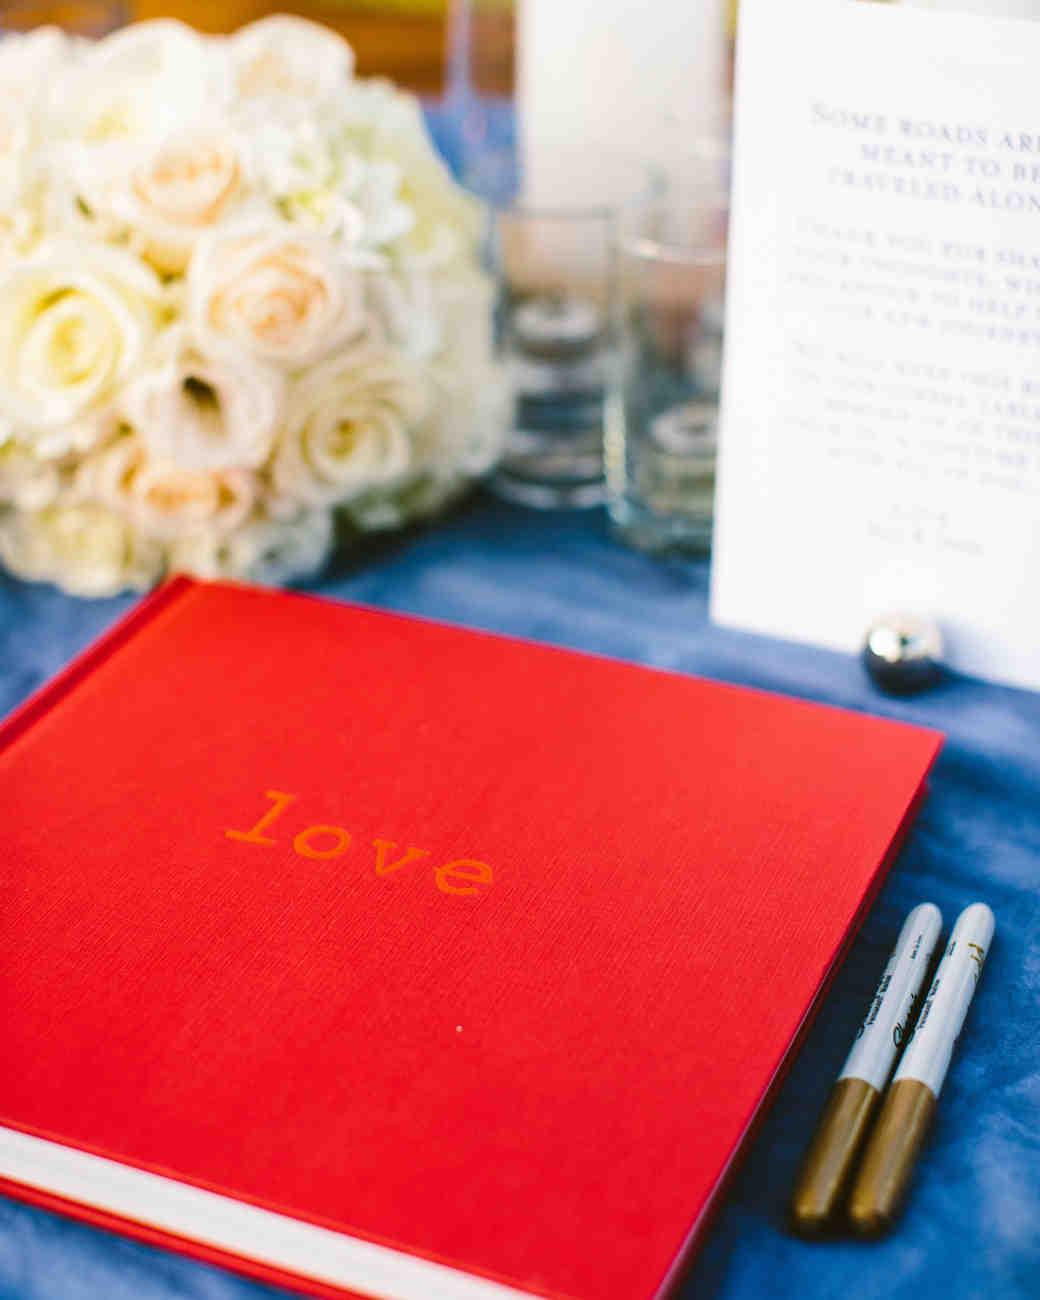 ali-jess-wedding-guestbook-032-002-s111717-1214.jpg